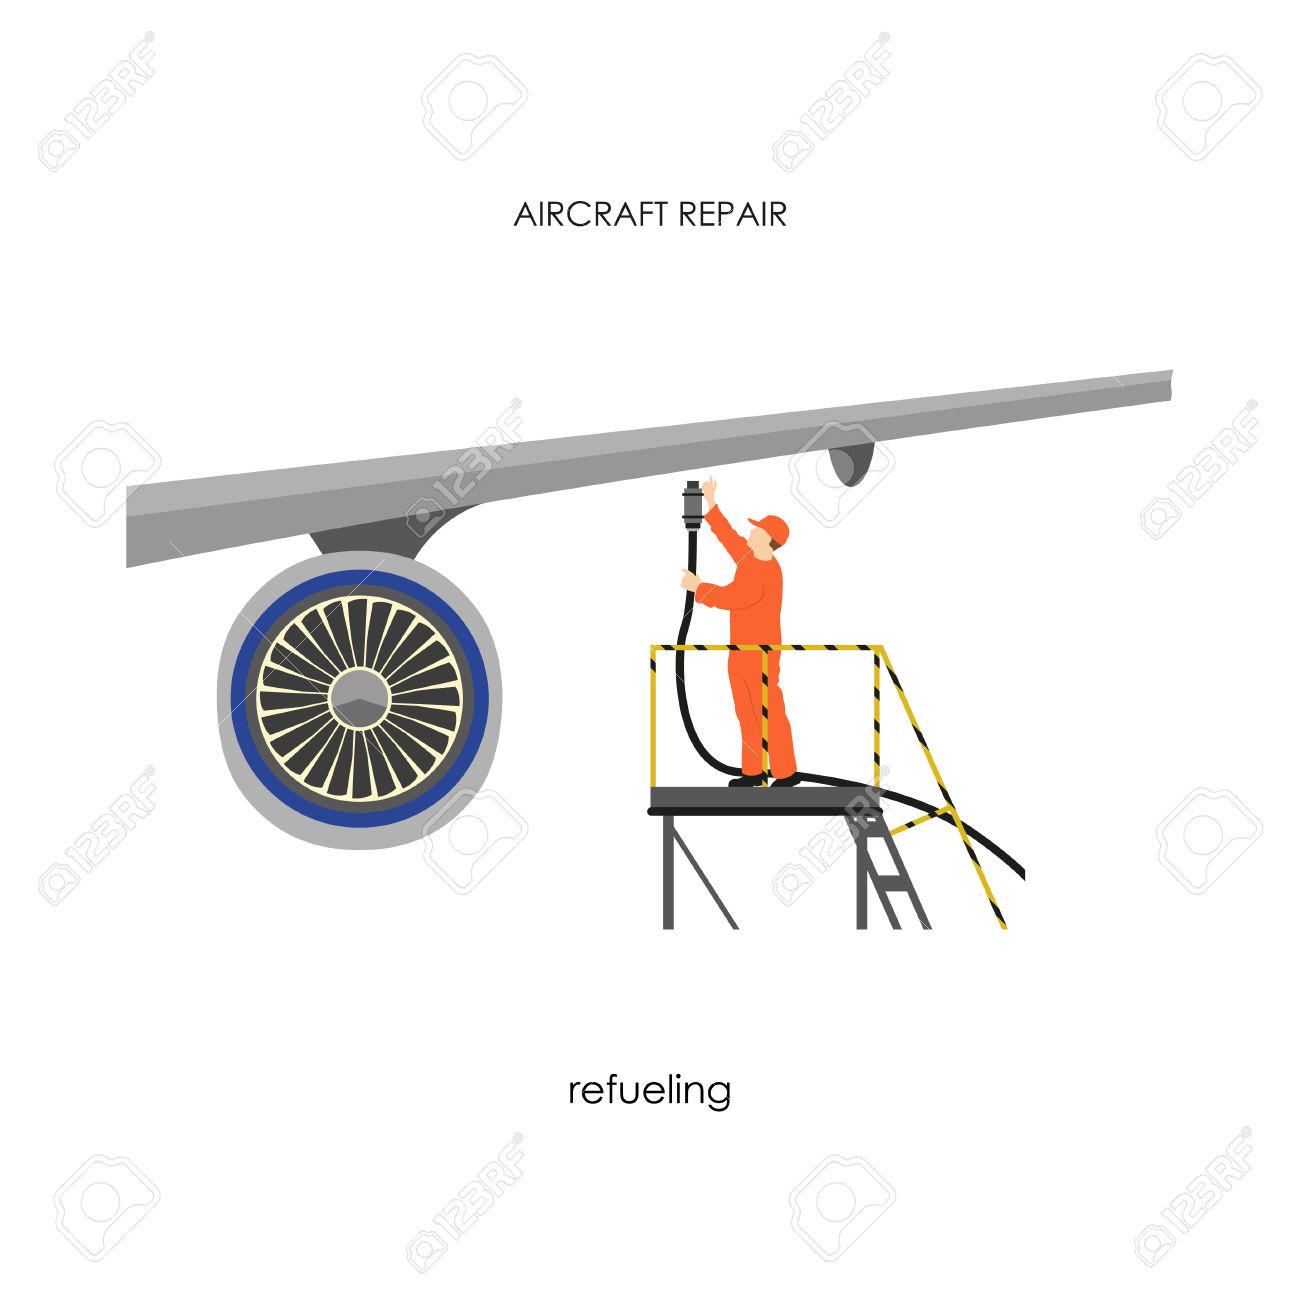 Repair And Maintenance Aircraft. Man Refueling Airplane. Vector.